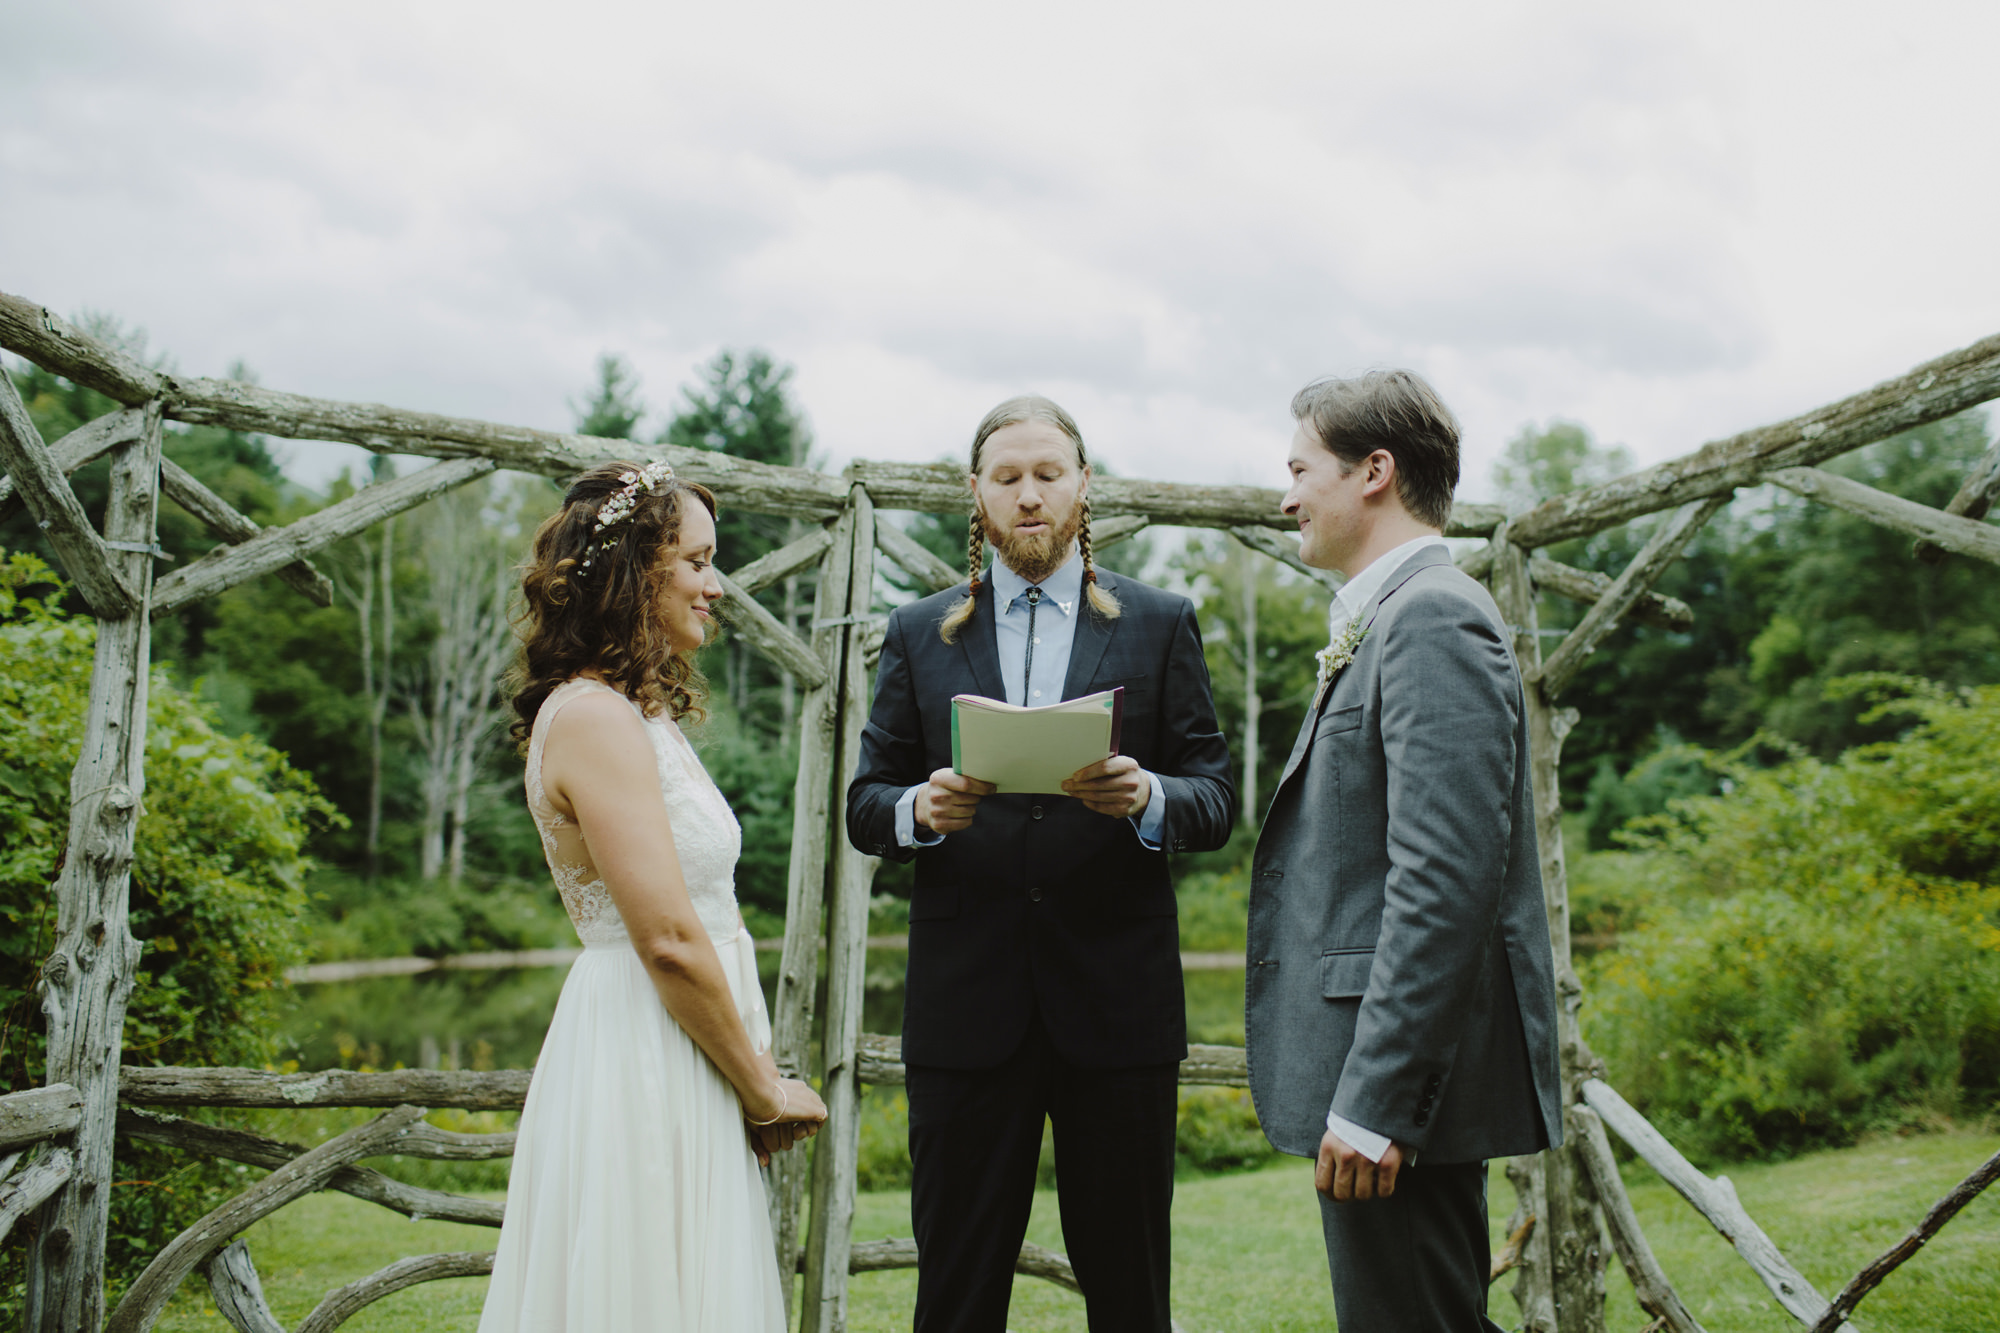 catskills_big_indian_springs_upstate_NY_wedding_sammblake055.jpg